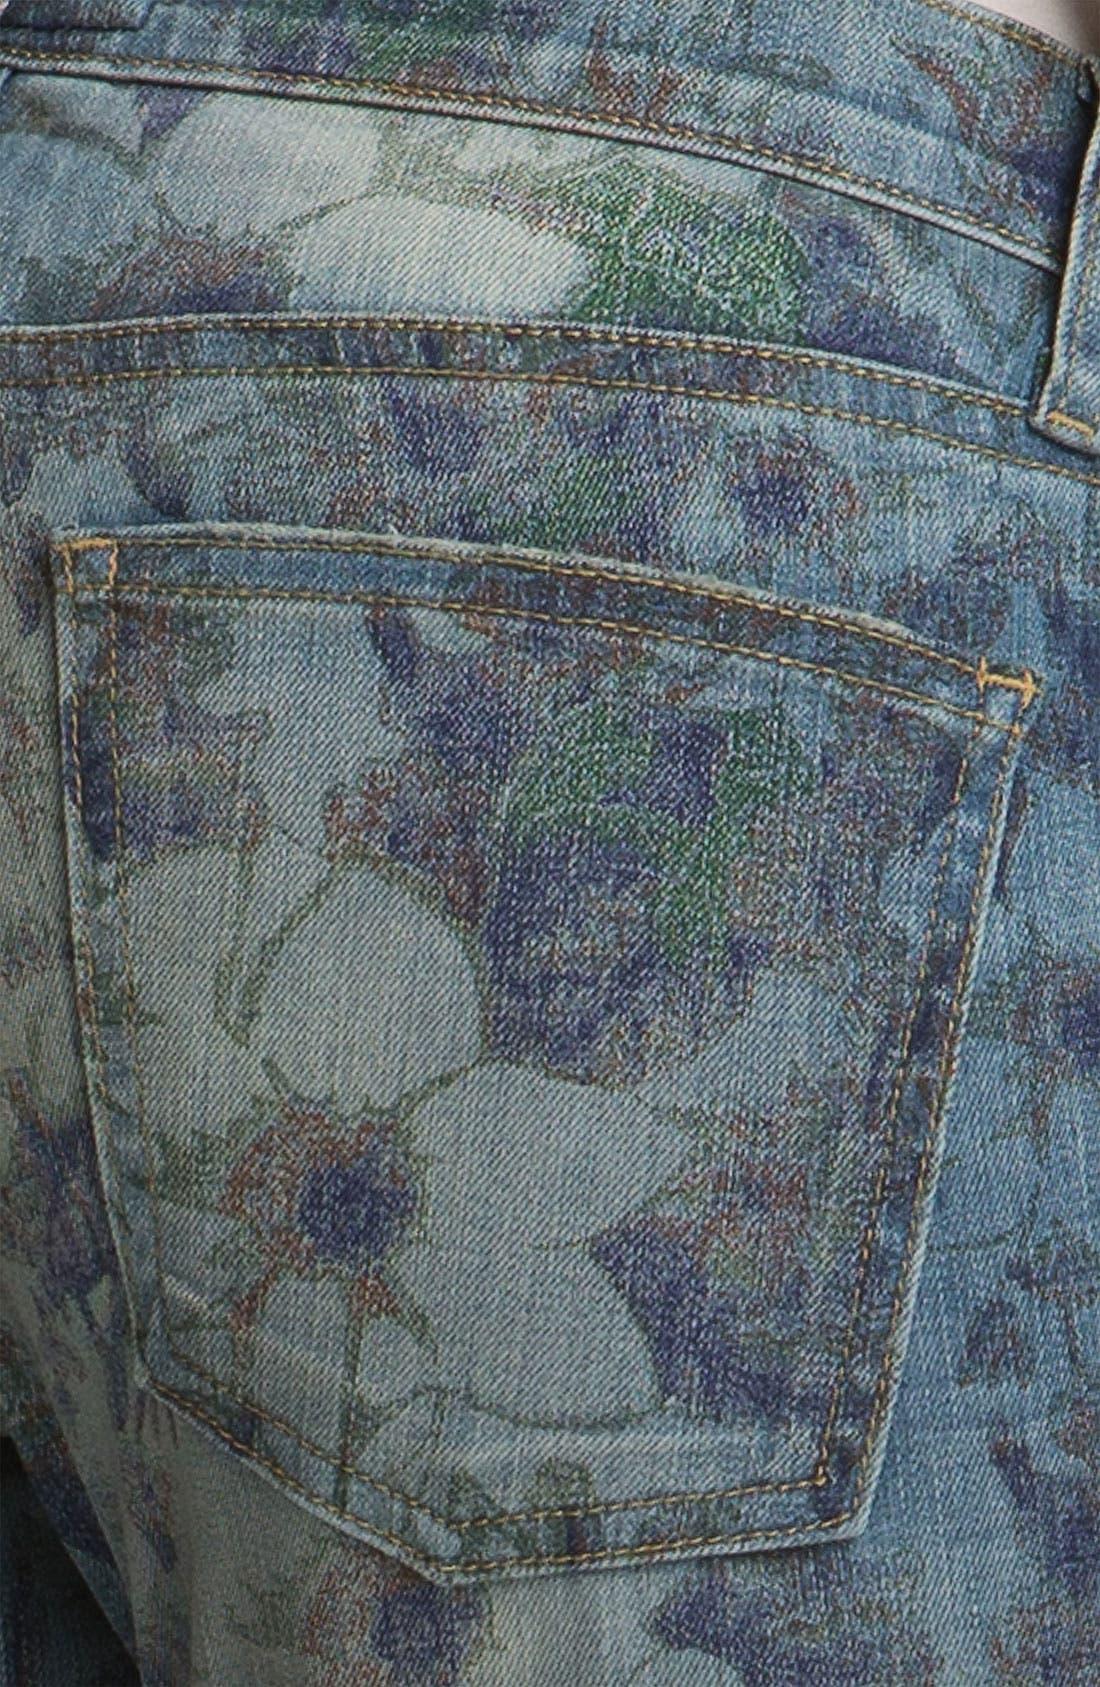 Alternate Image 4  - Current/Elliott 'The Stiletto' Burnout Floral Print Stretch Jeans